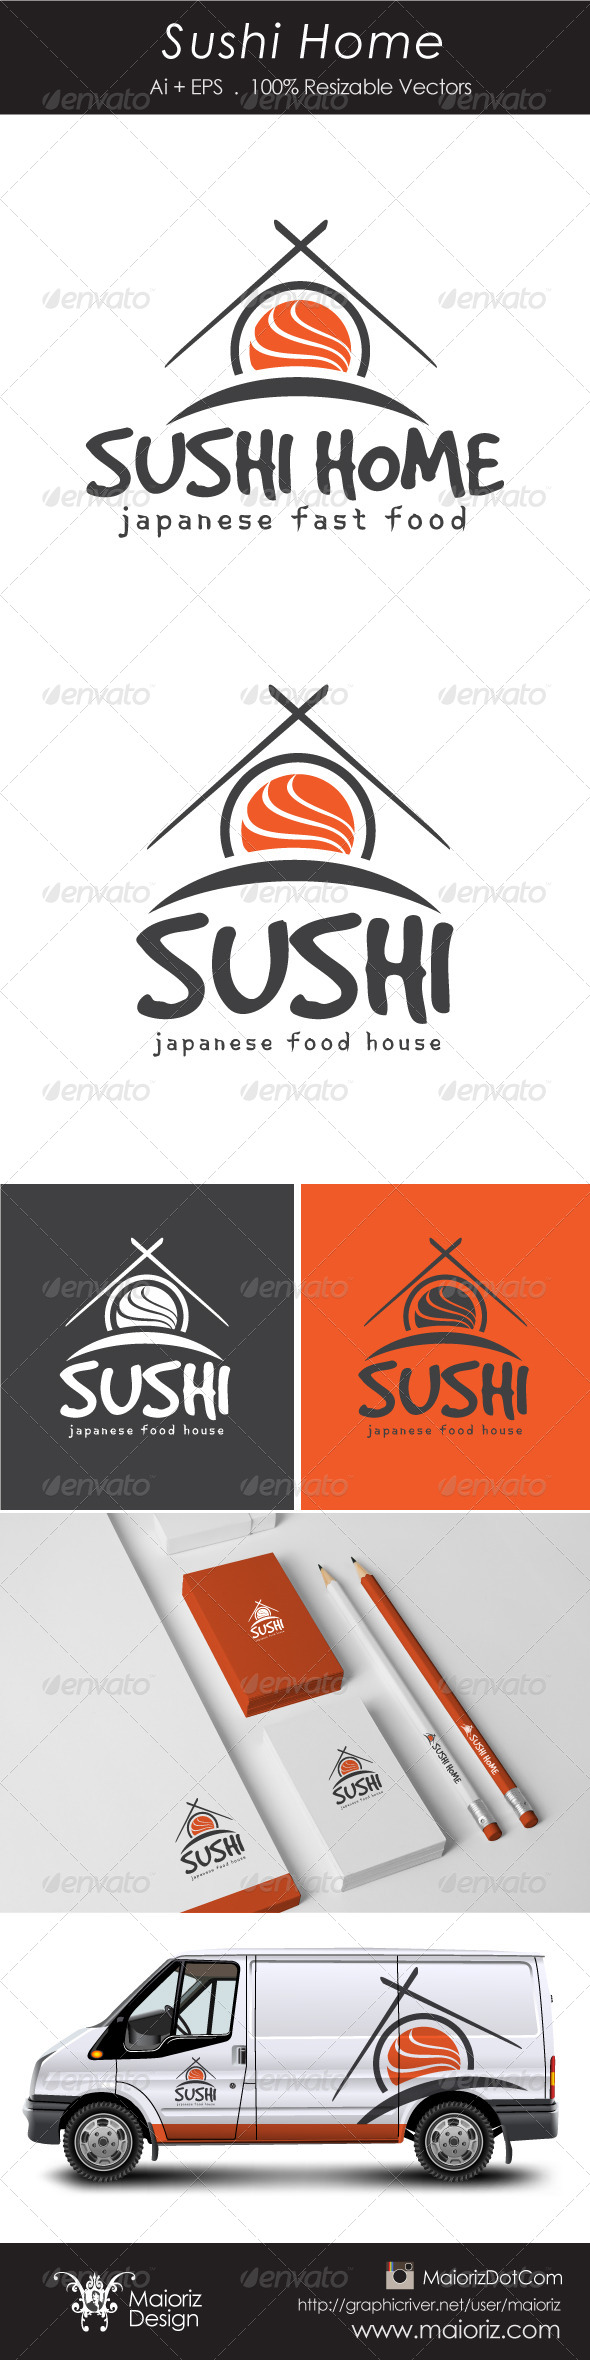 Sushi Home Logotype - Food Logo Templates